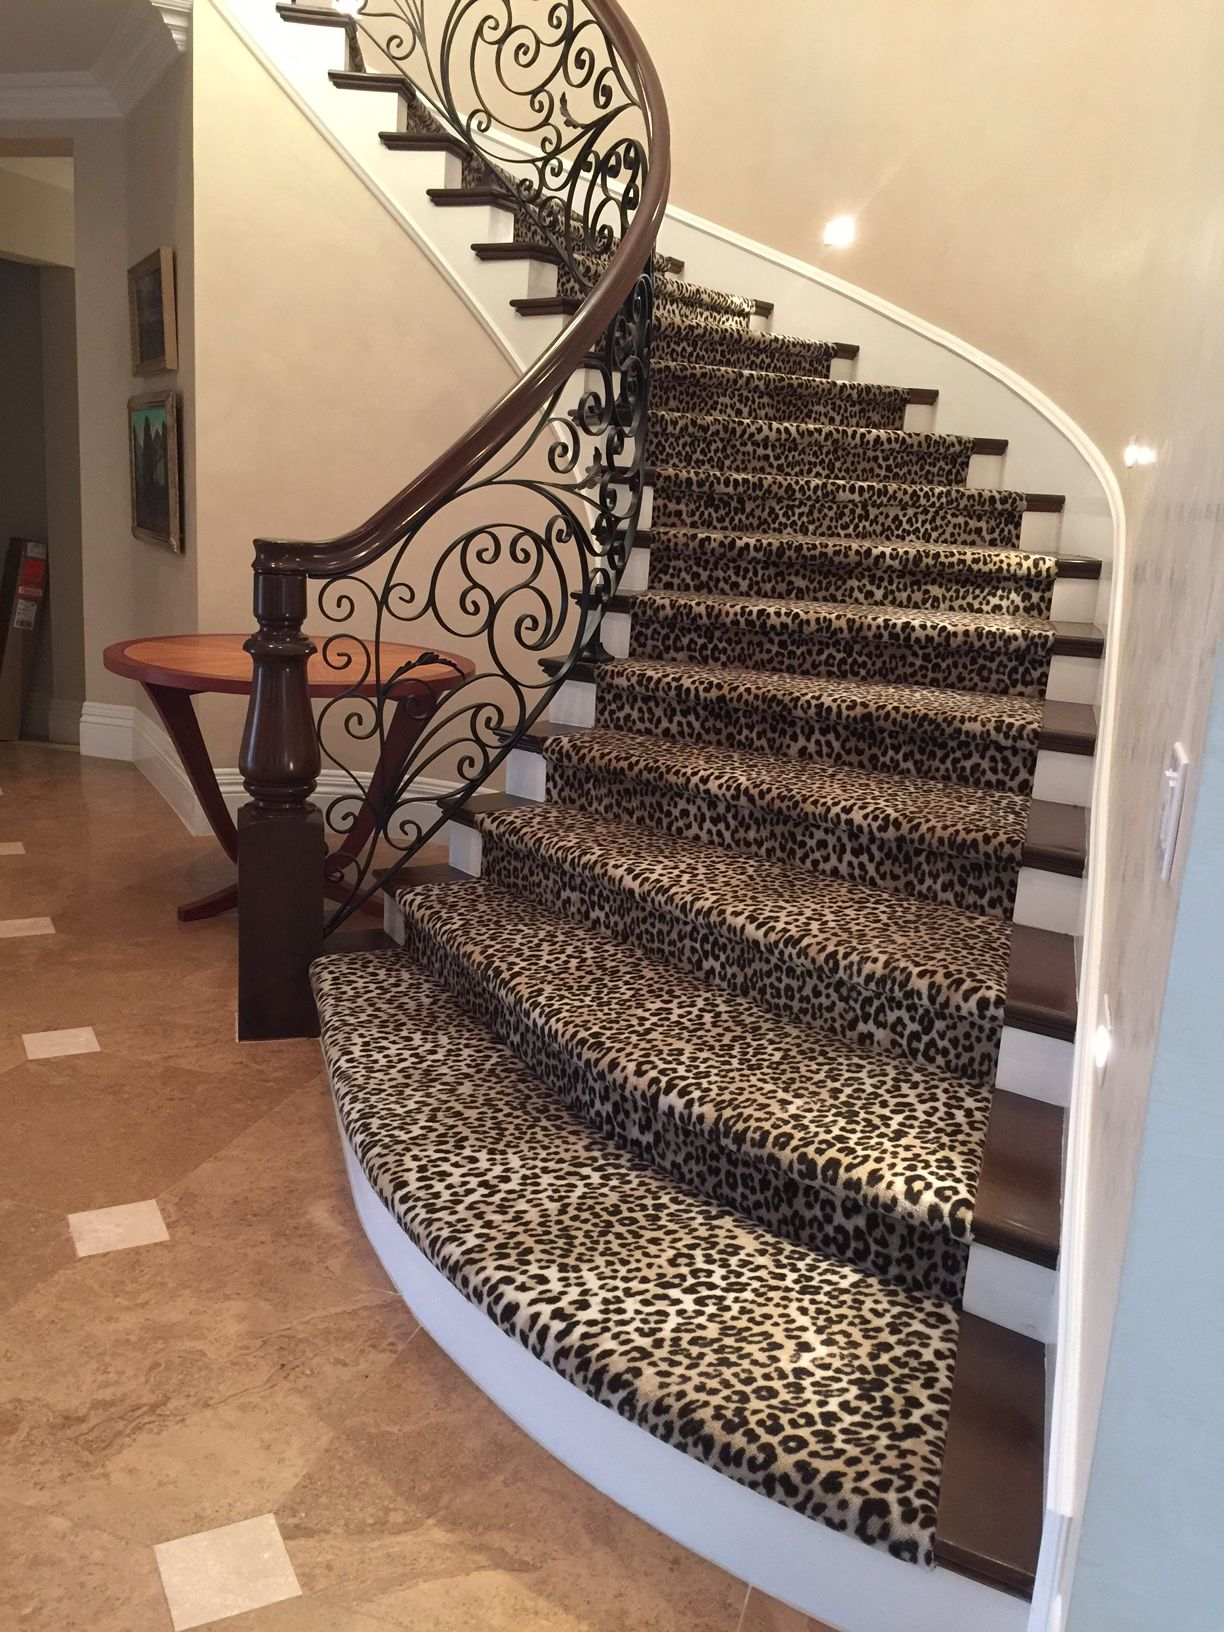 Best Love The Leopard Big Cat Wool Carpet Fabricated Into A 400 x 300